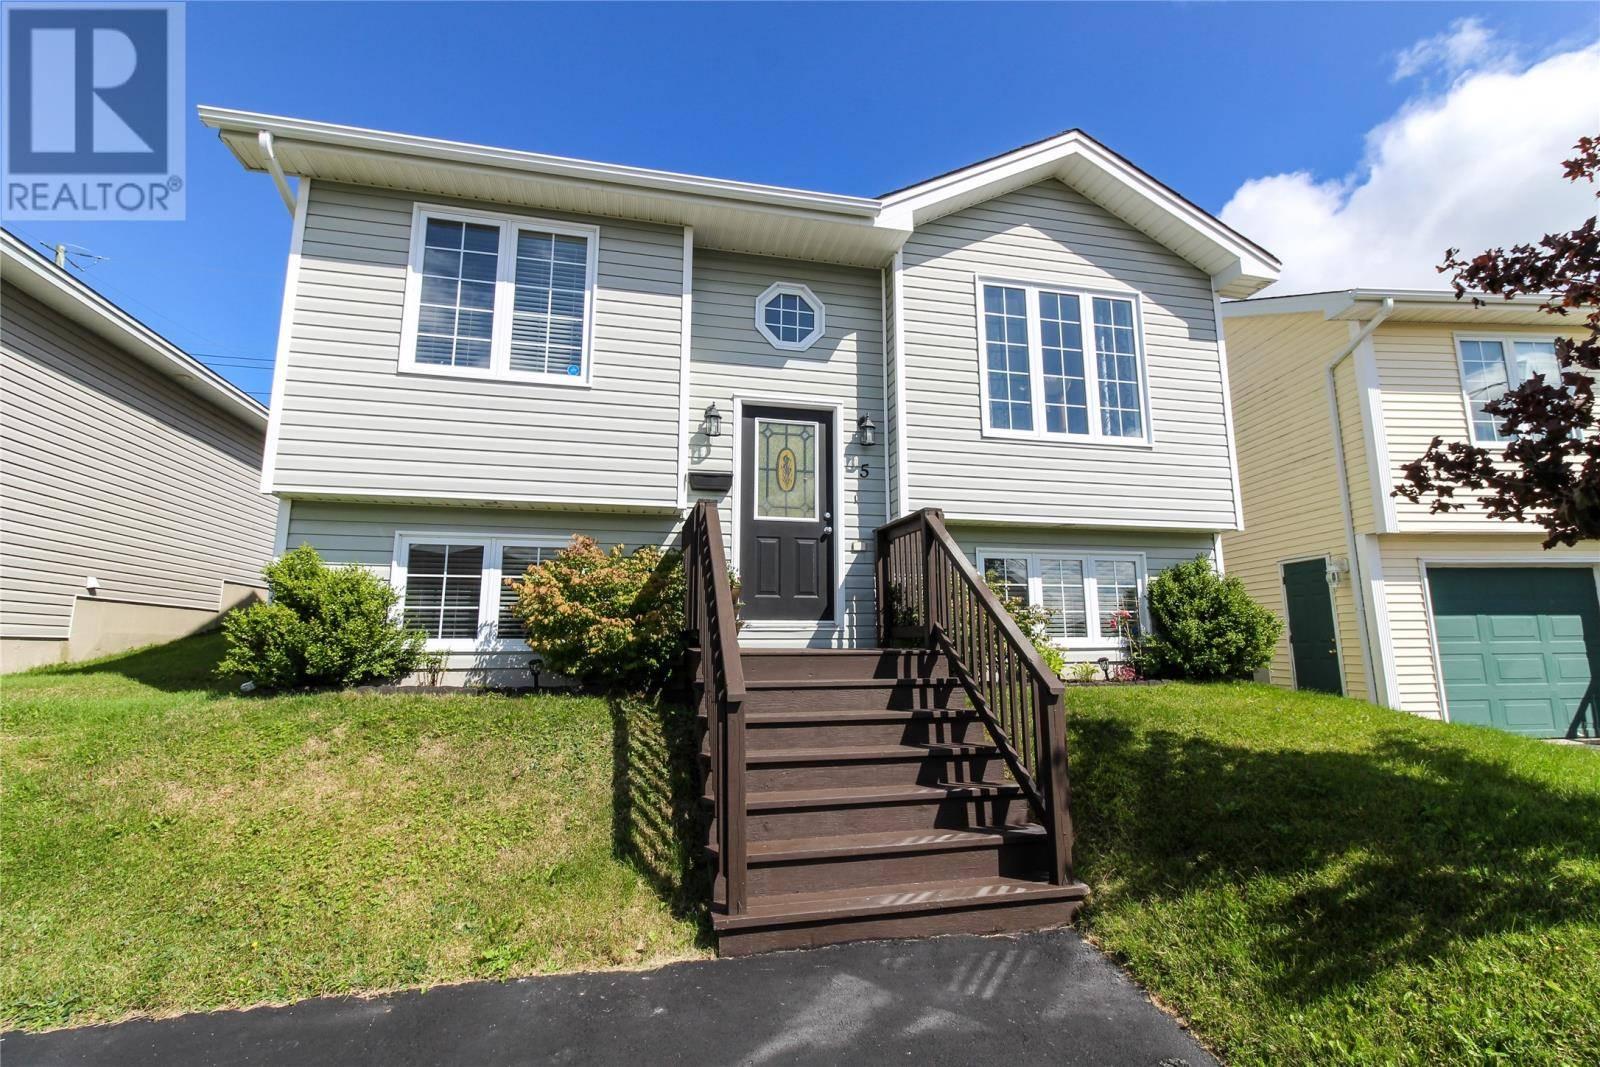 House for sale at 5 Irish Loop St St. John's Newfoundland - MLS: 1202837